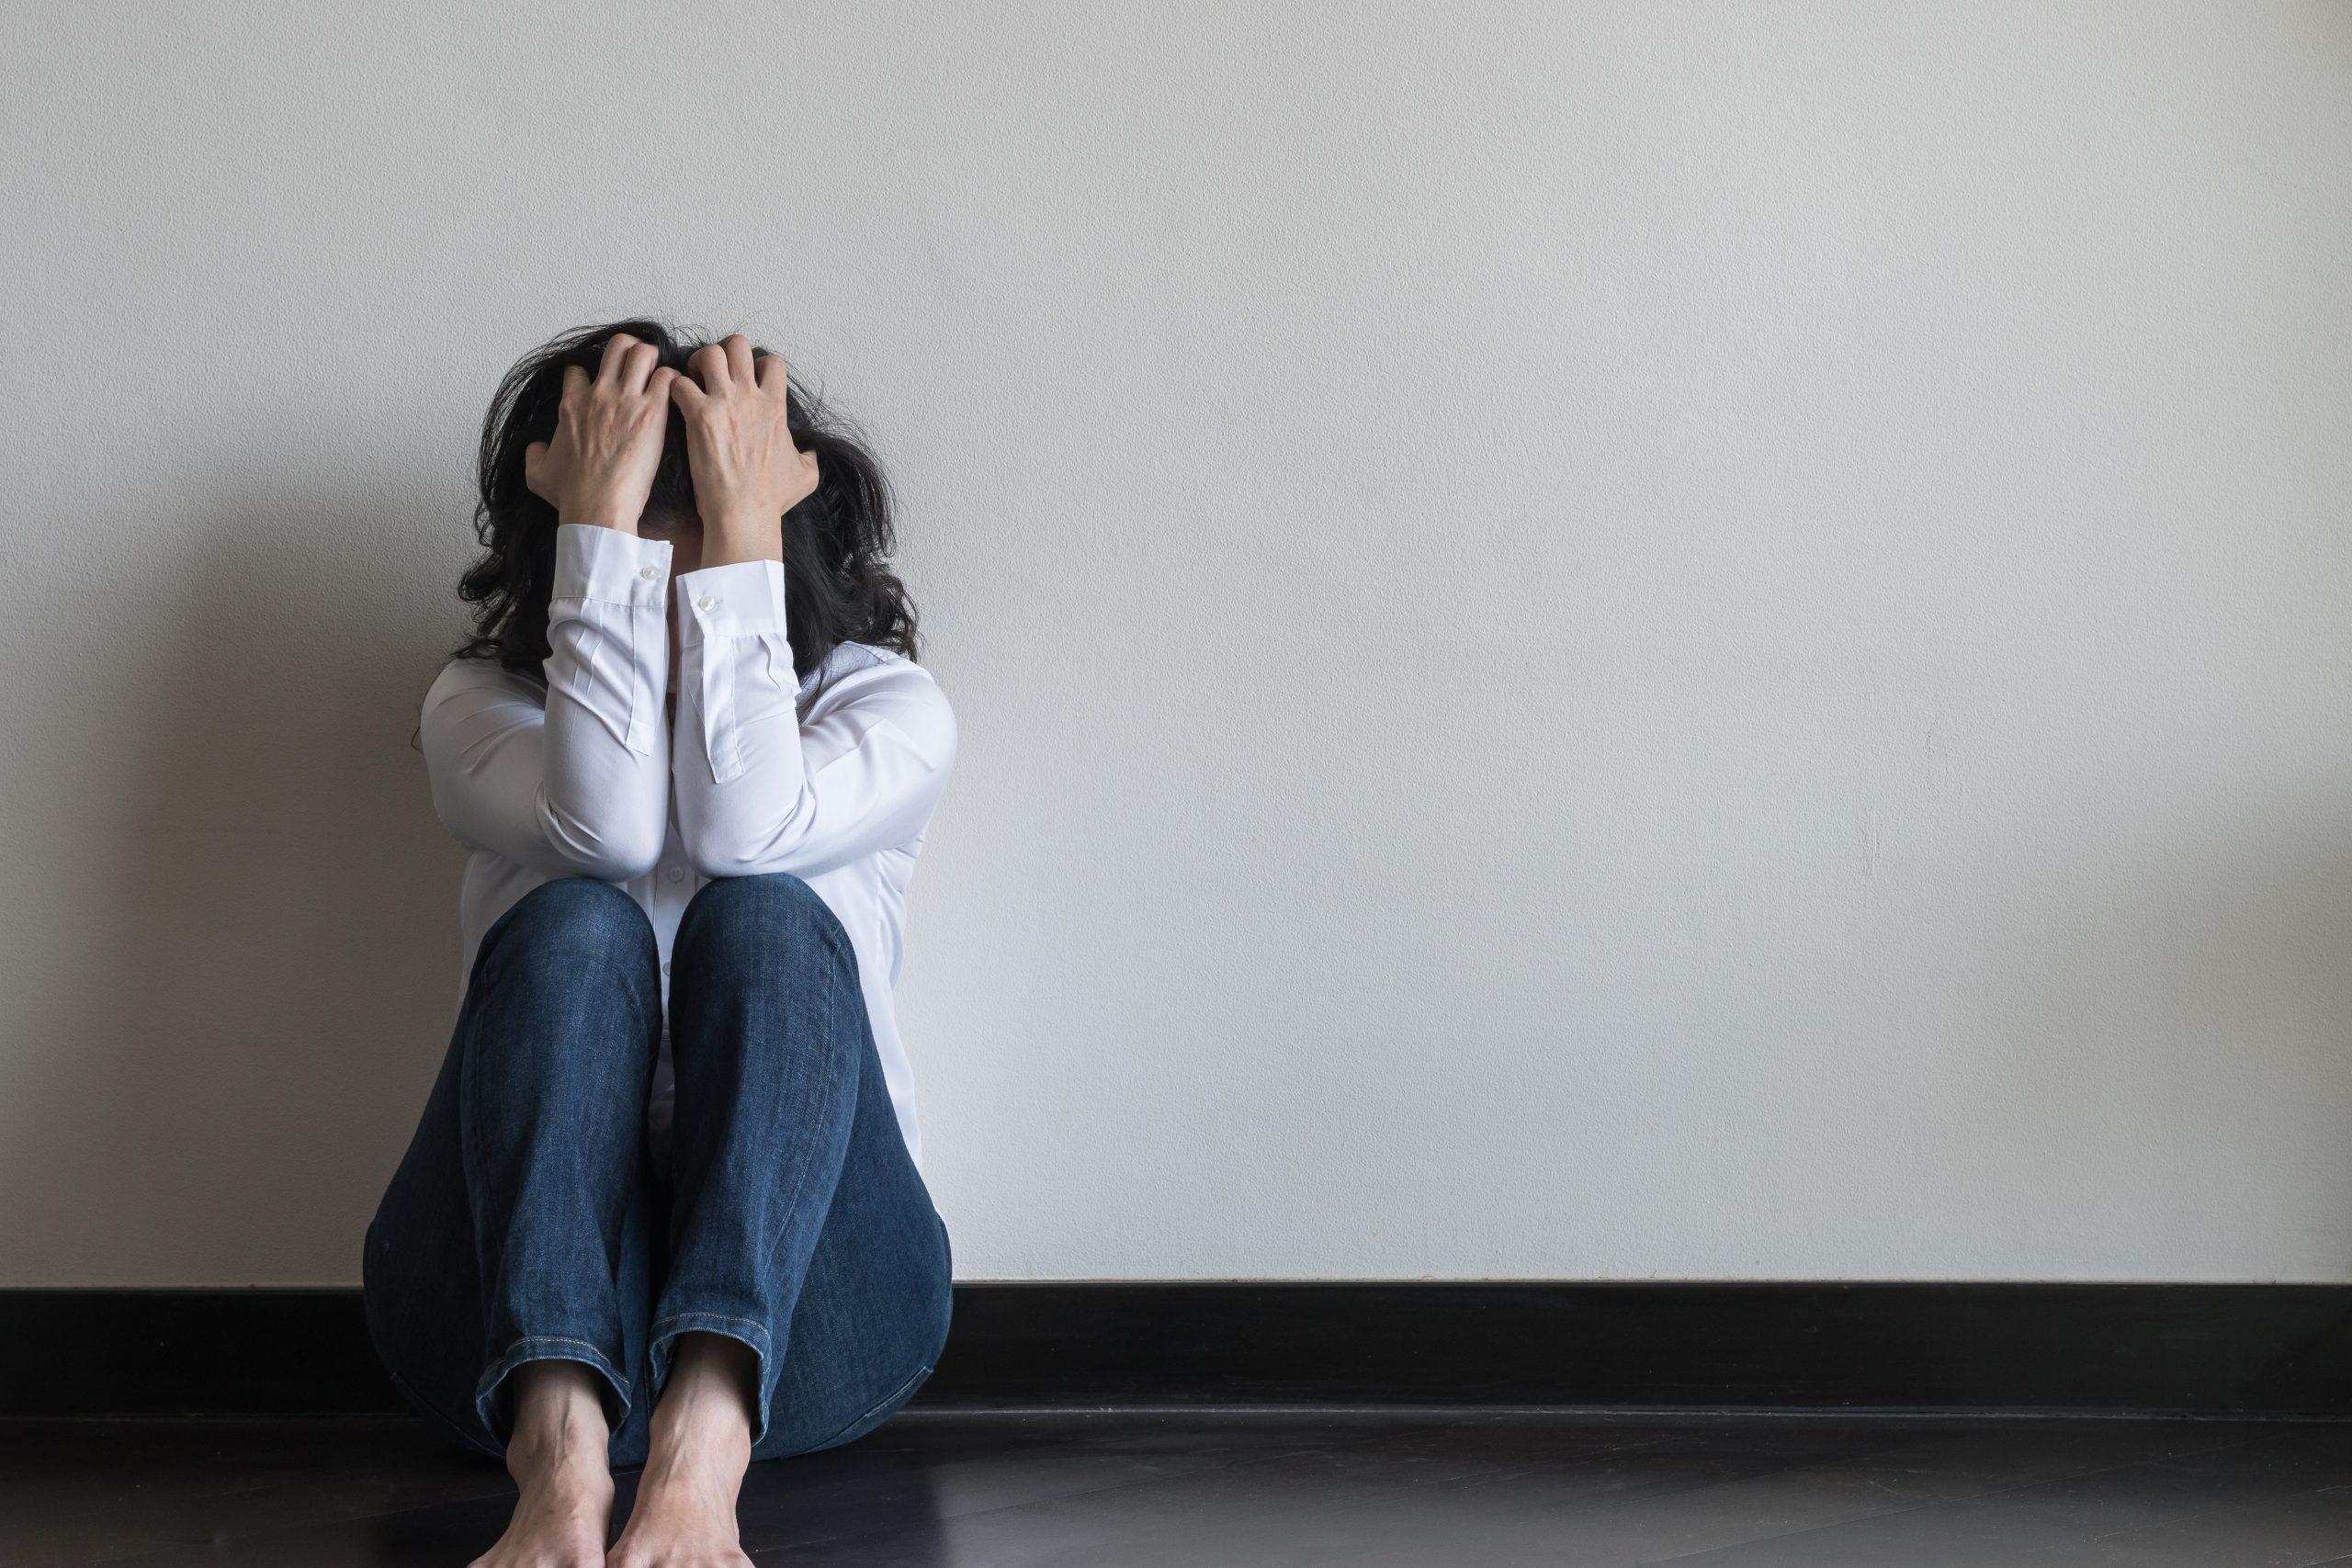 Overcoming fear of socialising post-lockdown